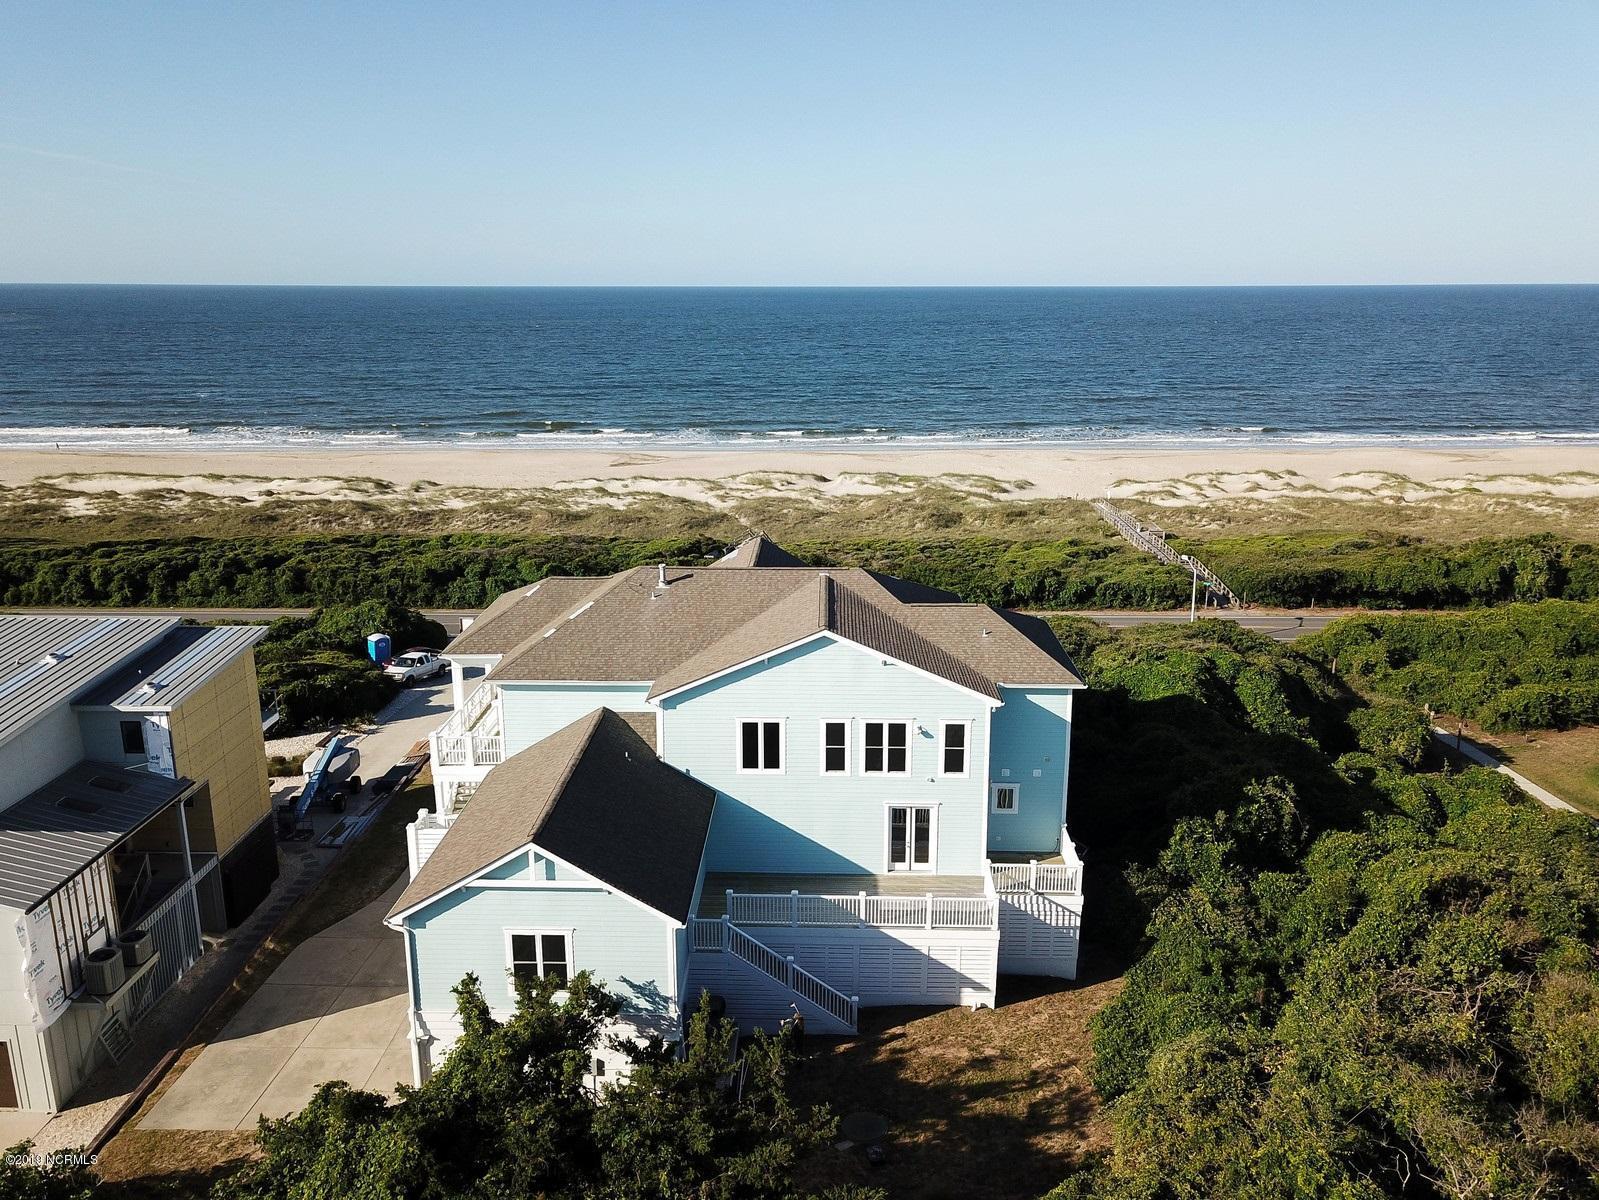 800 Caswell Beach Road Caswell Beach, NC 28465